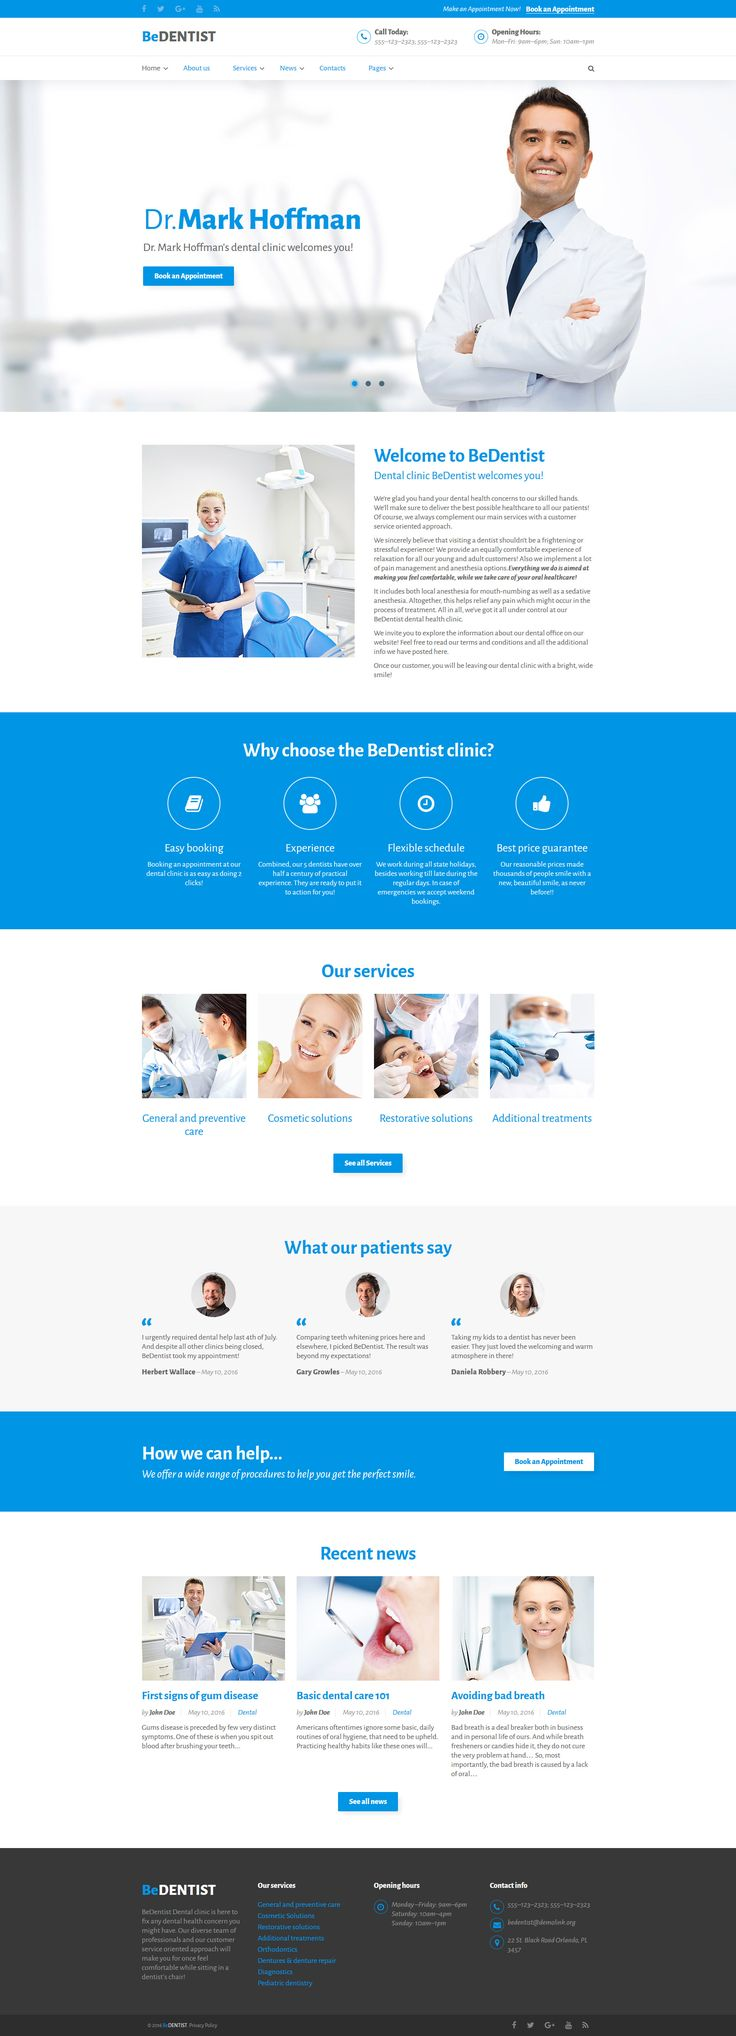 Dentistry Responsive Website Template http://www.templatemonster.com/website-templates/dentistry-responsive-website-template-60036.html